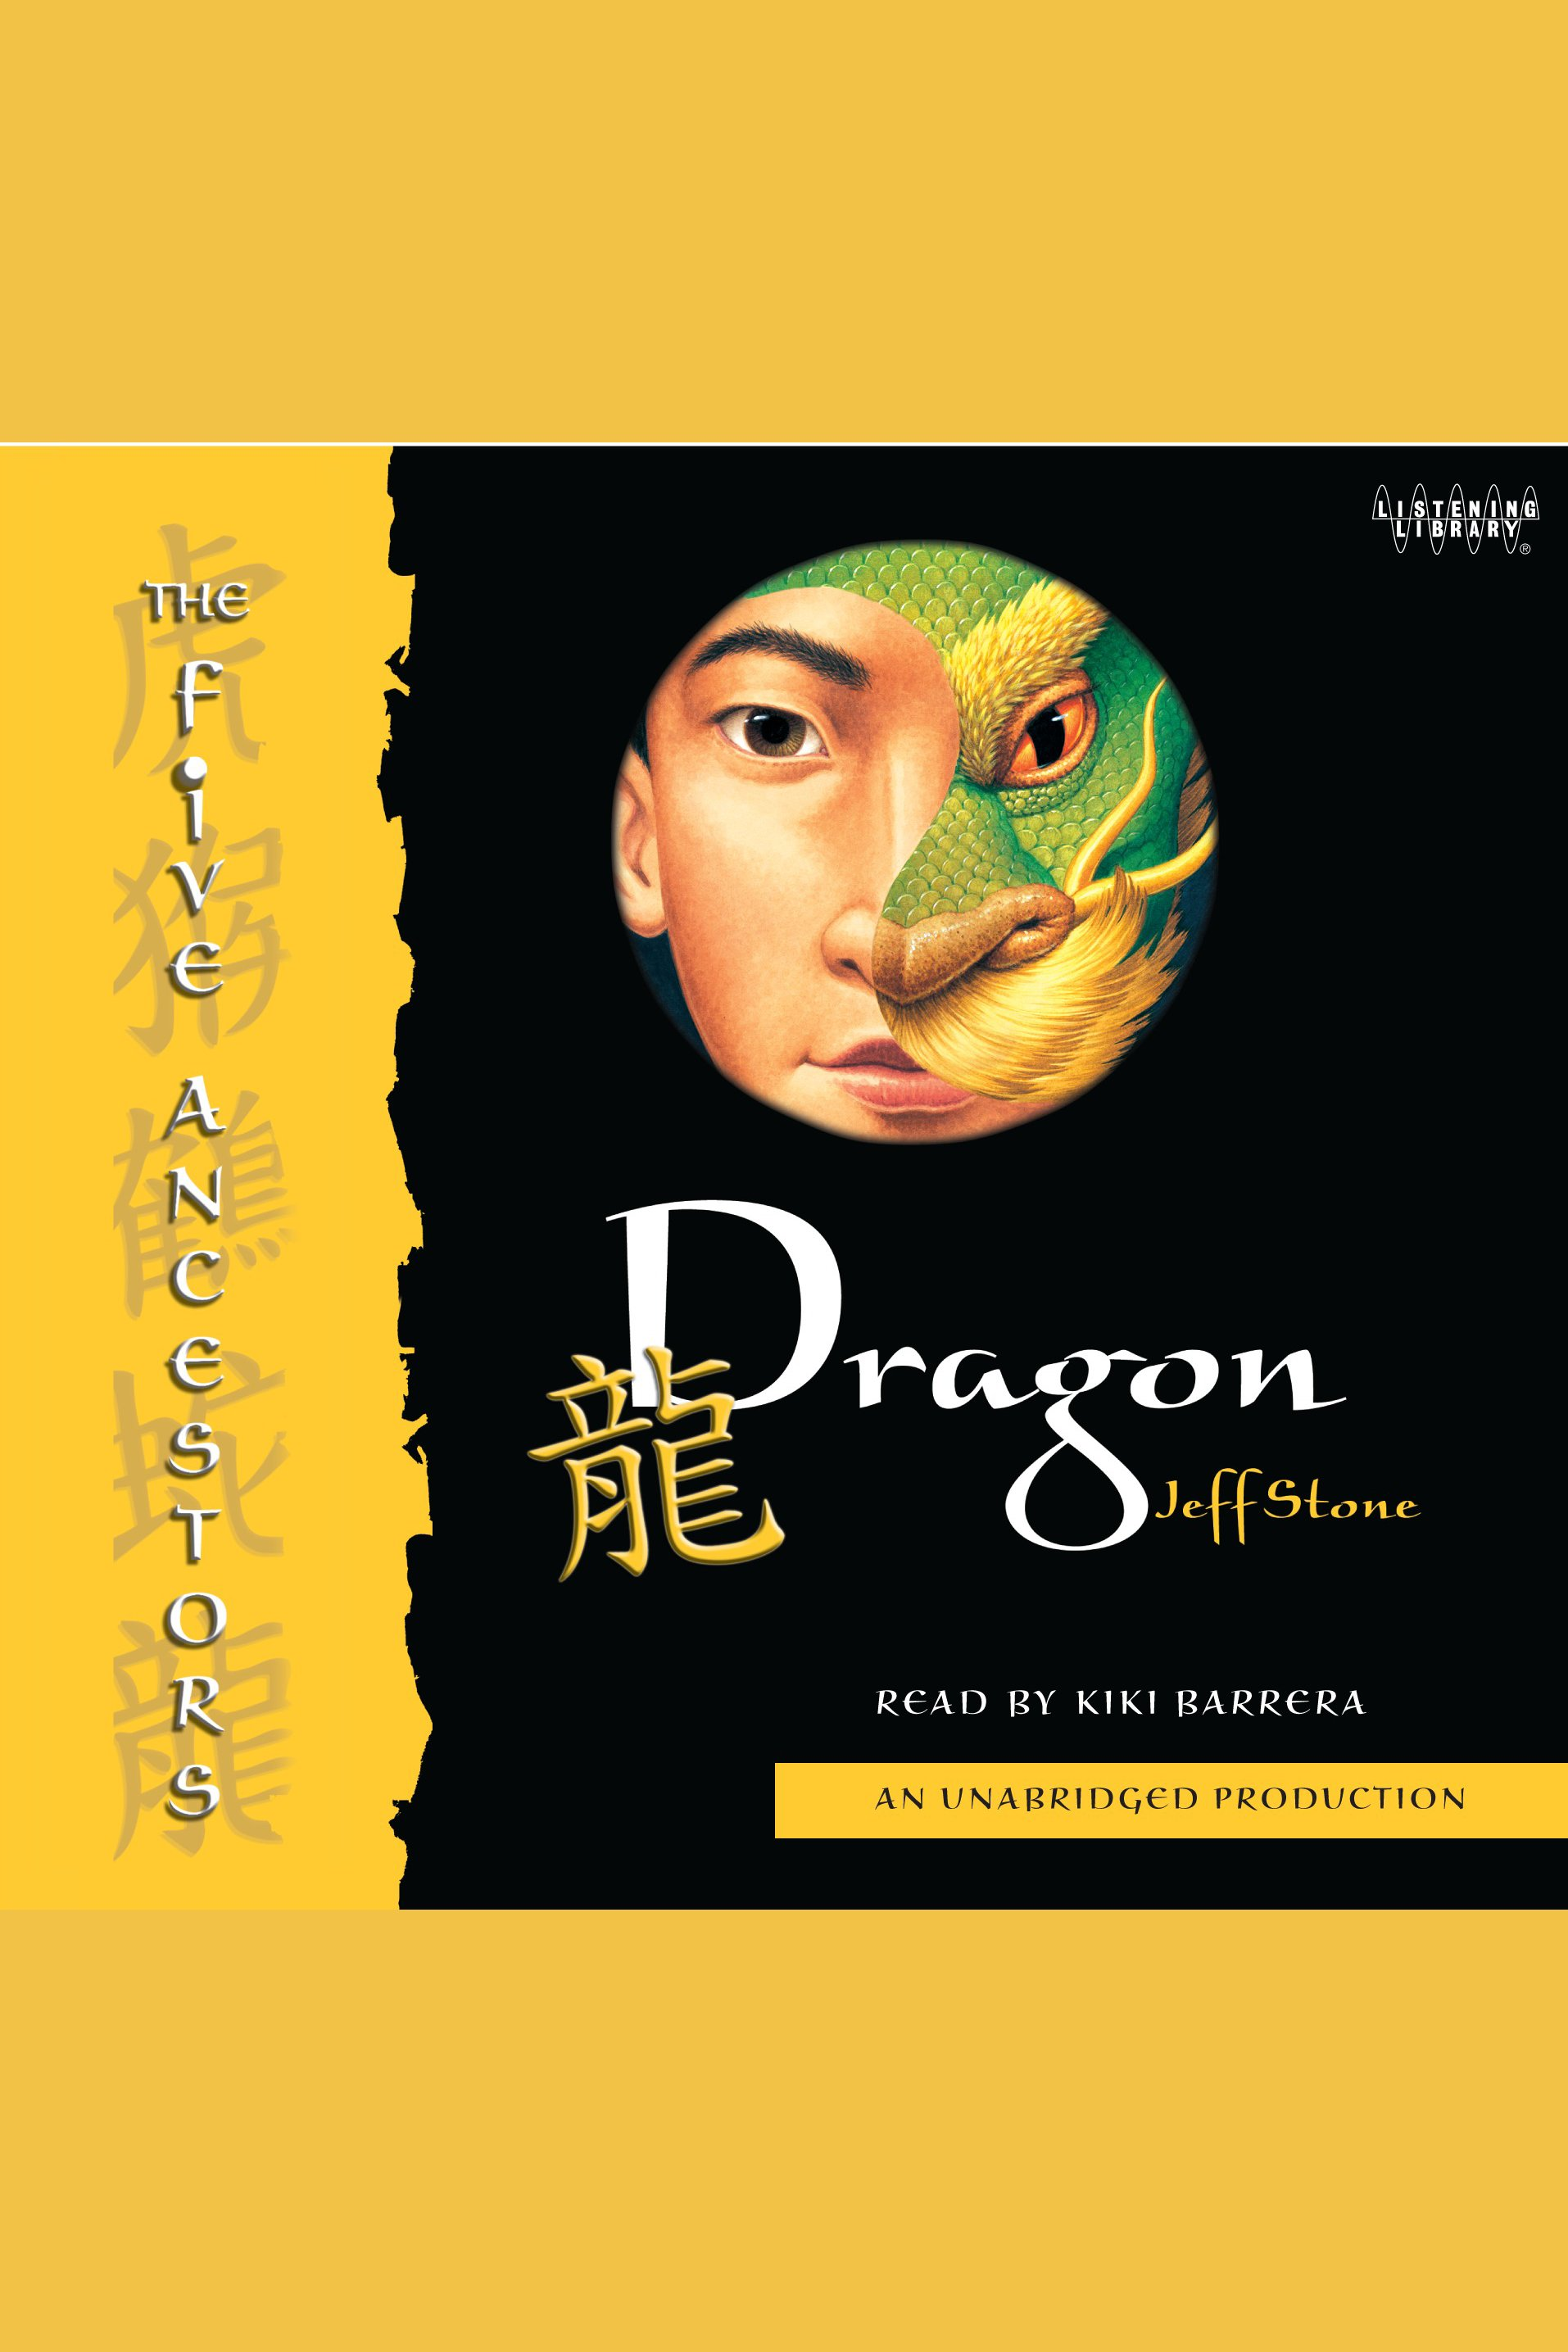 Dragon cover image